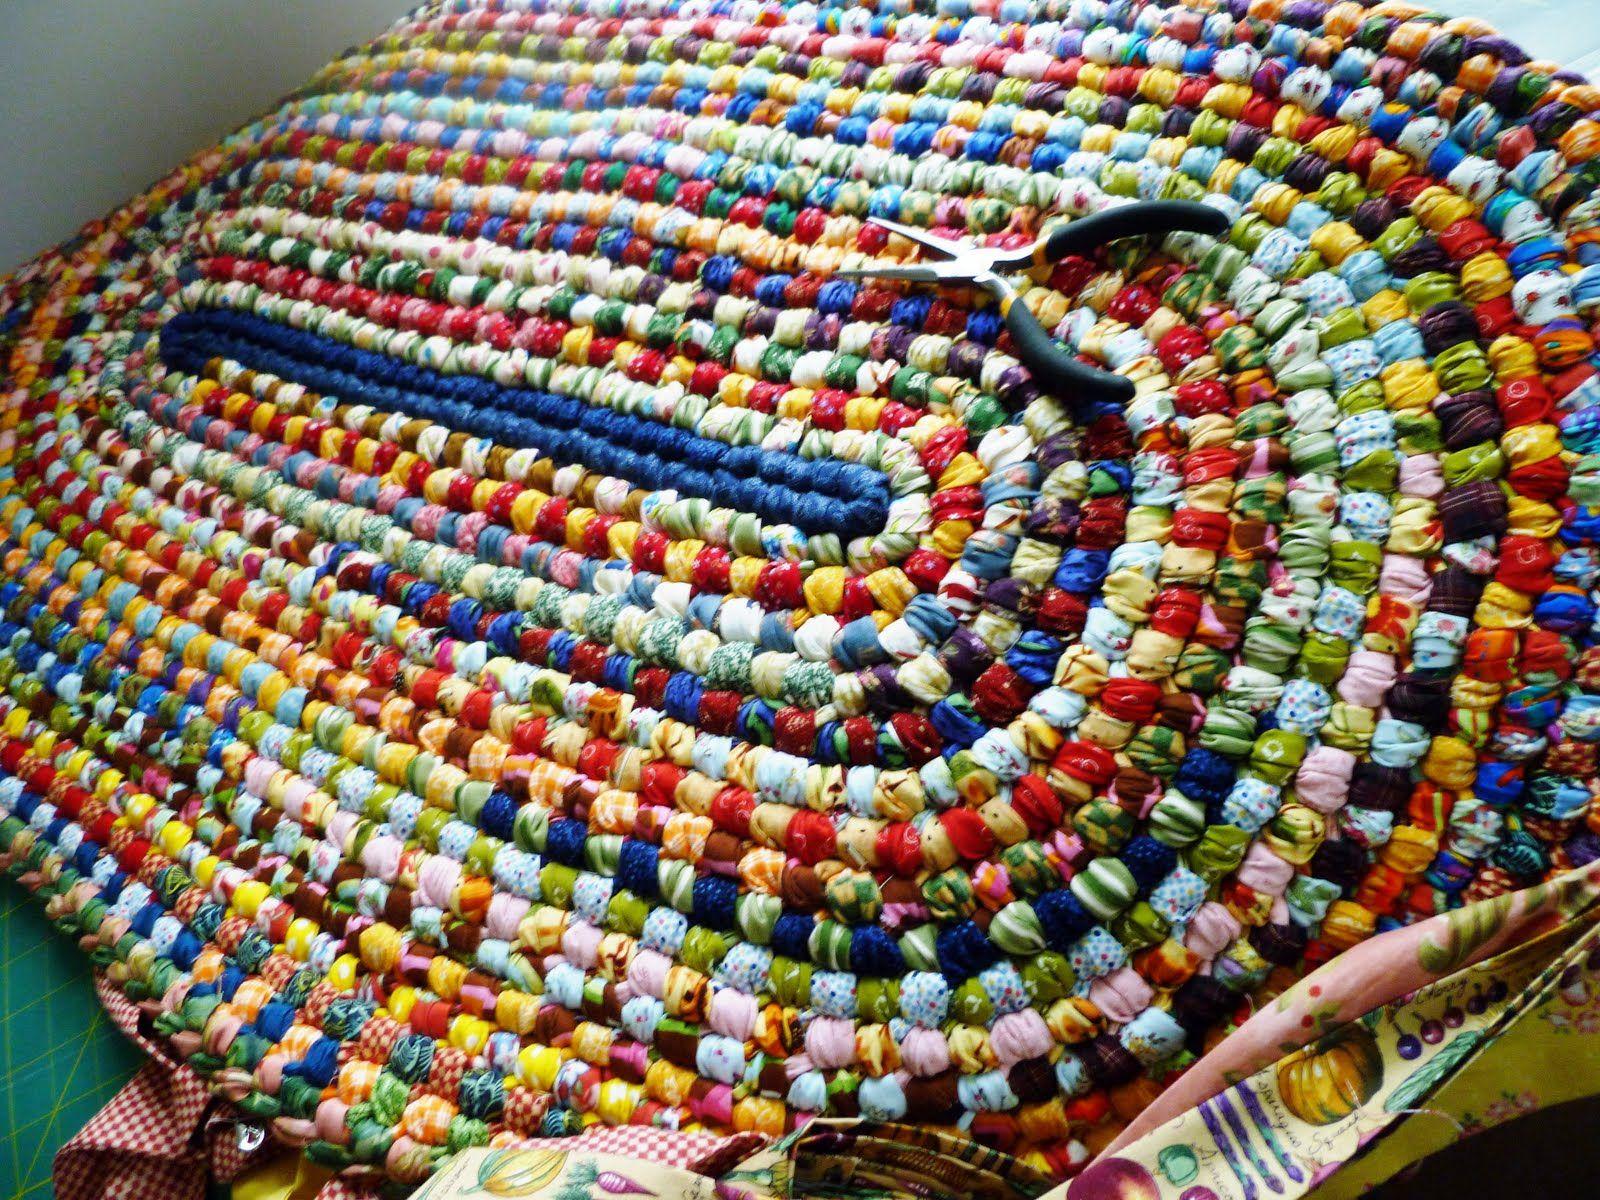 Knitting Or Crocheting Classes : Between knitting teaching a crochet class and waiting